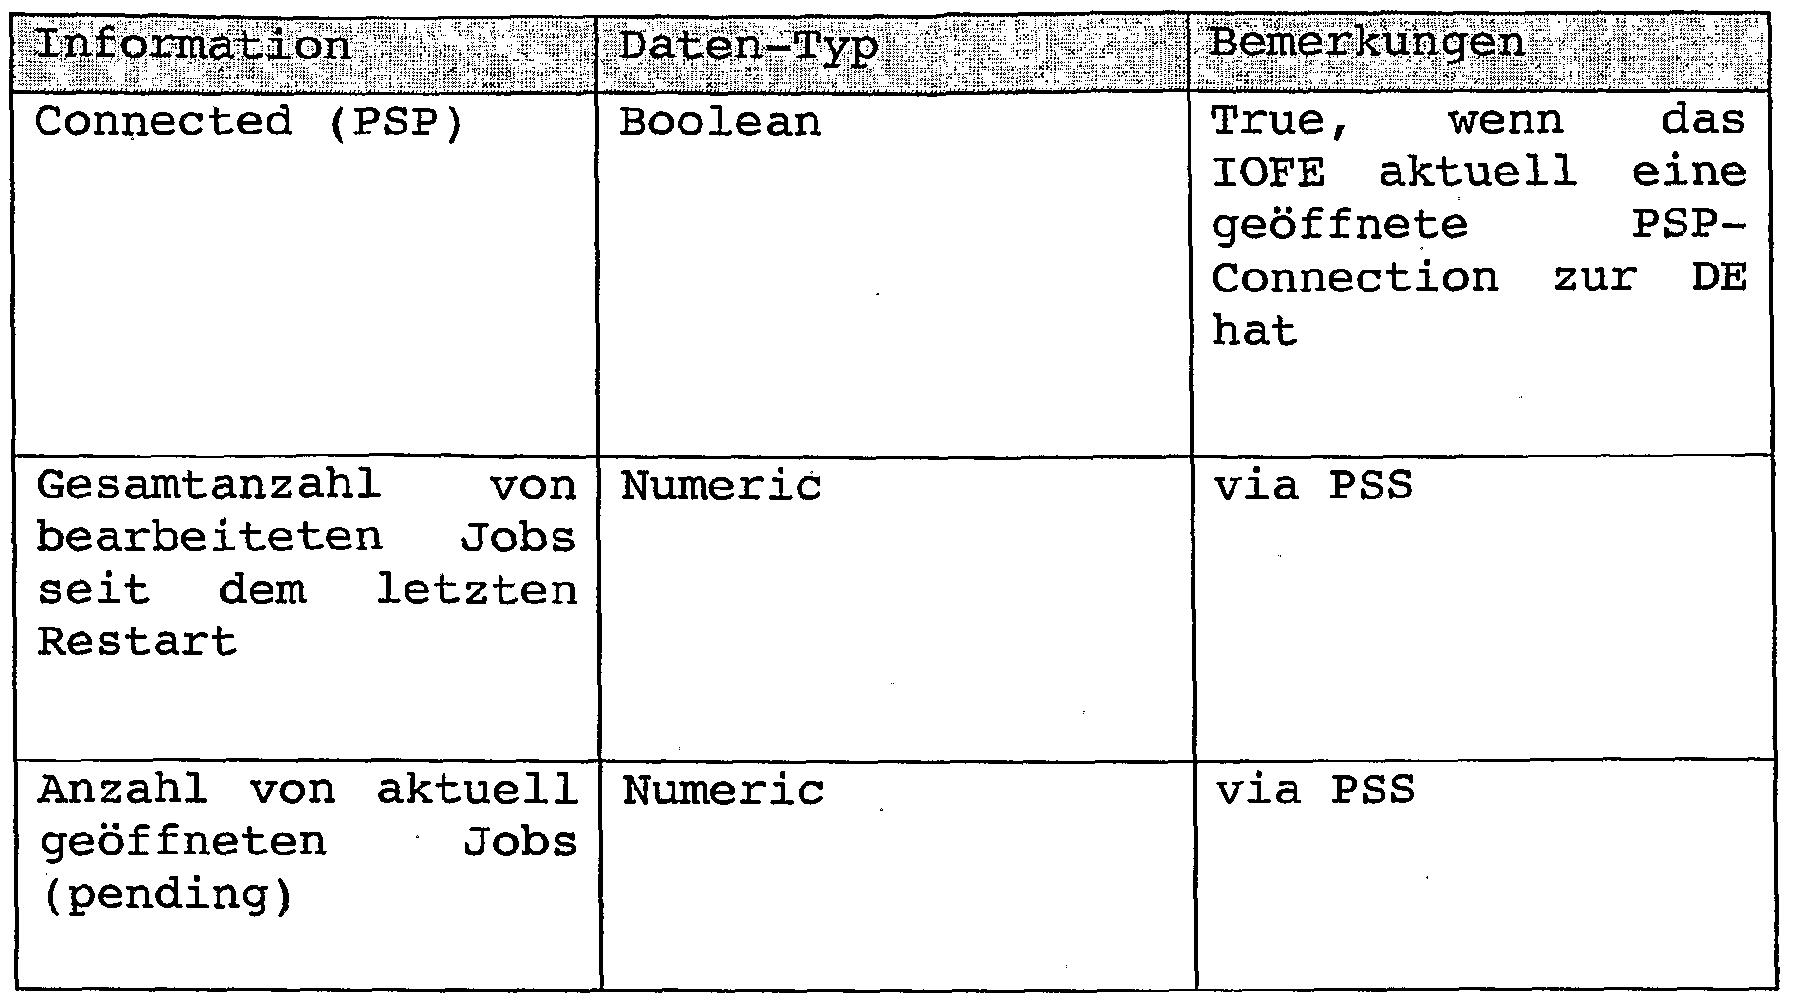 Fantastisch Parsing Tool Fortsetzen Ideen - Entry Level Resume ...